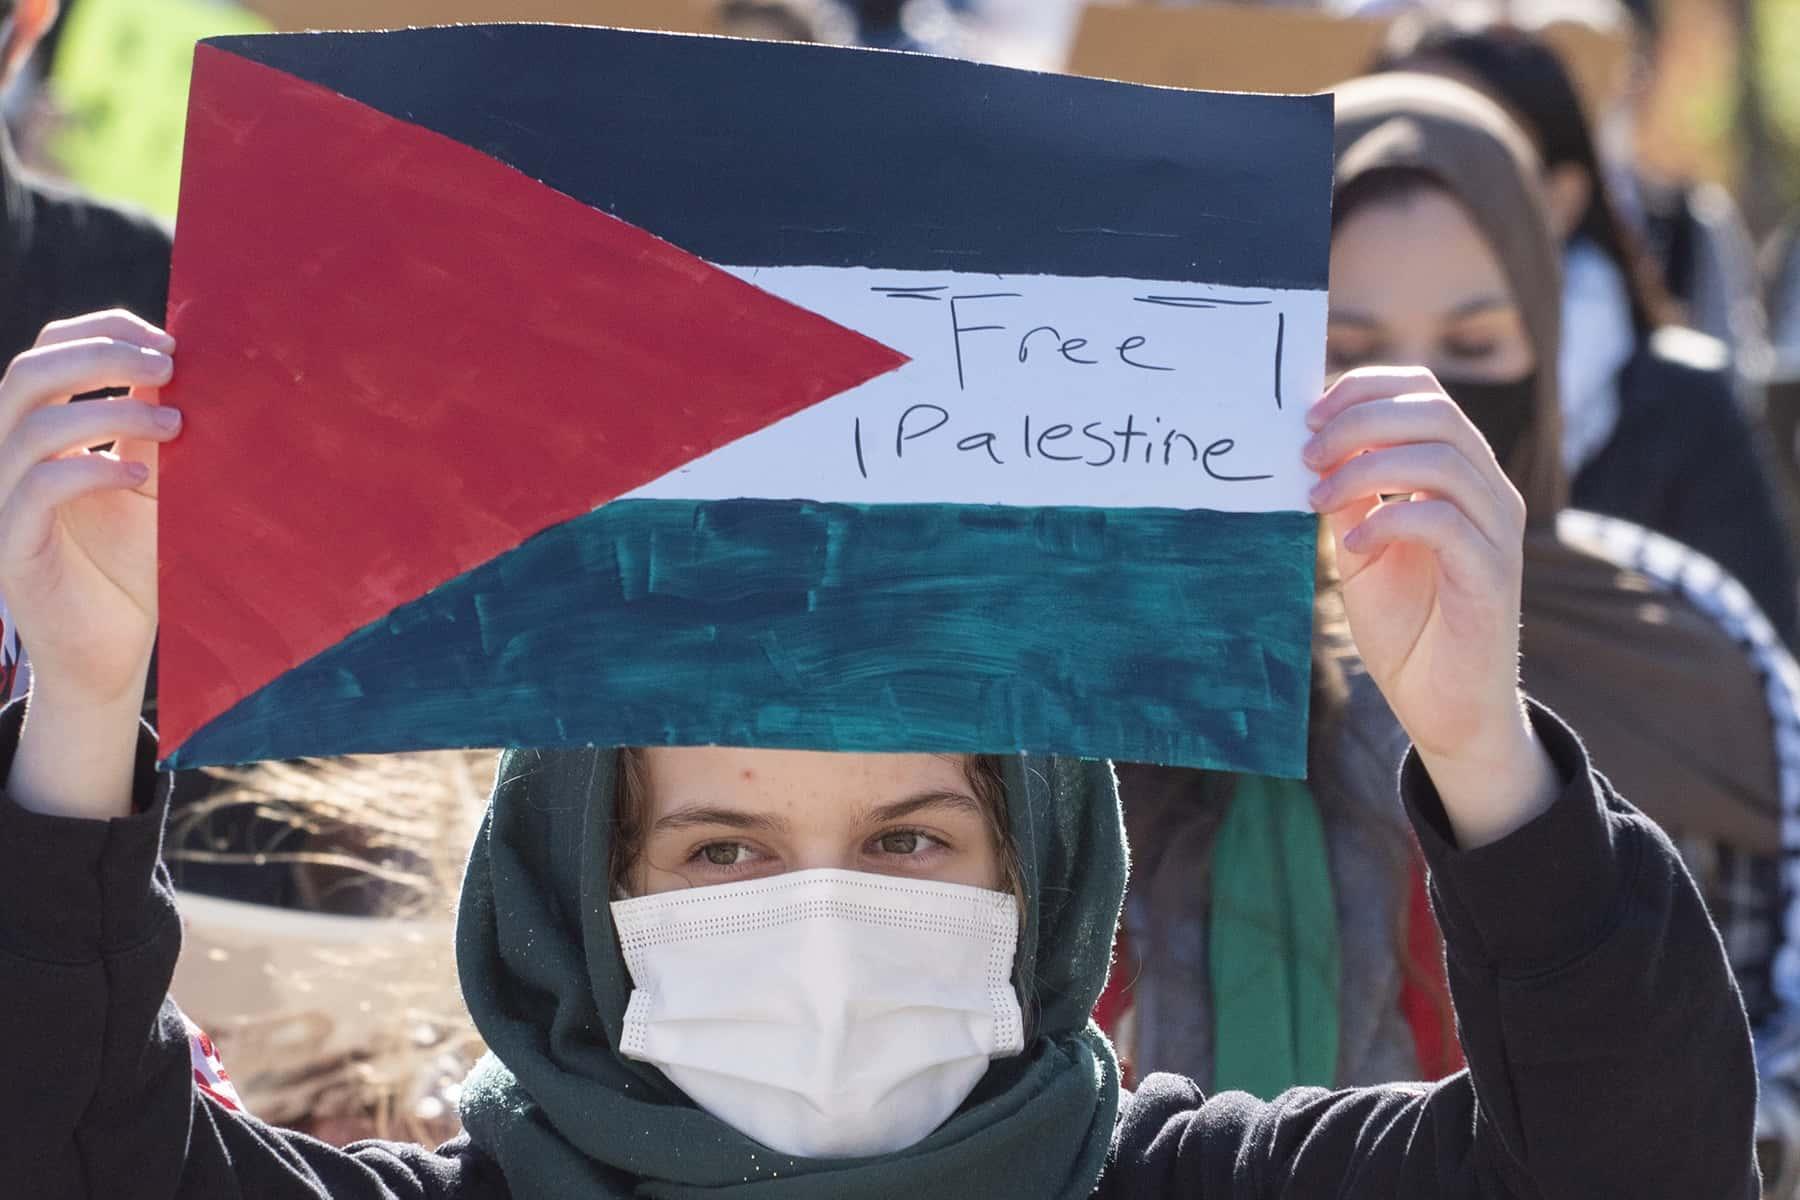 05_051221_PalestineRallyMKE_058